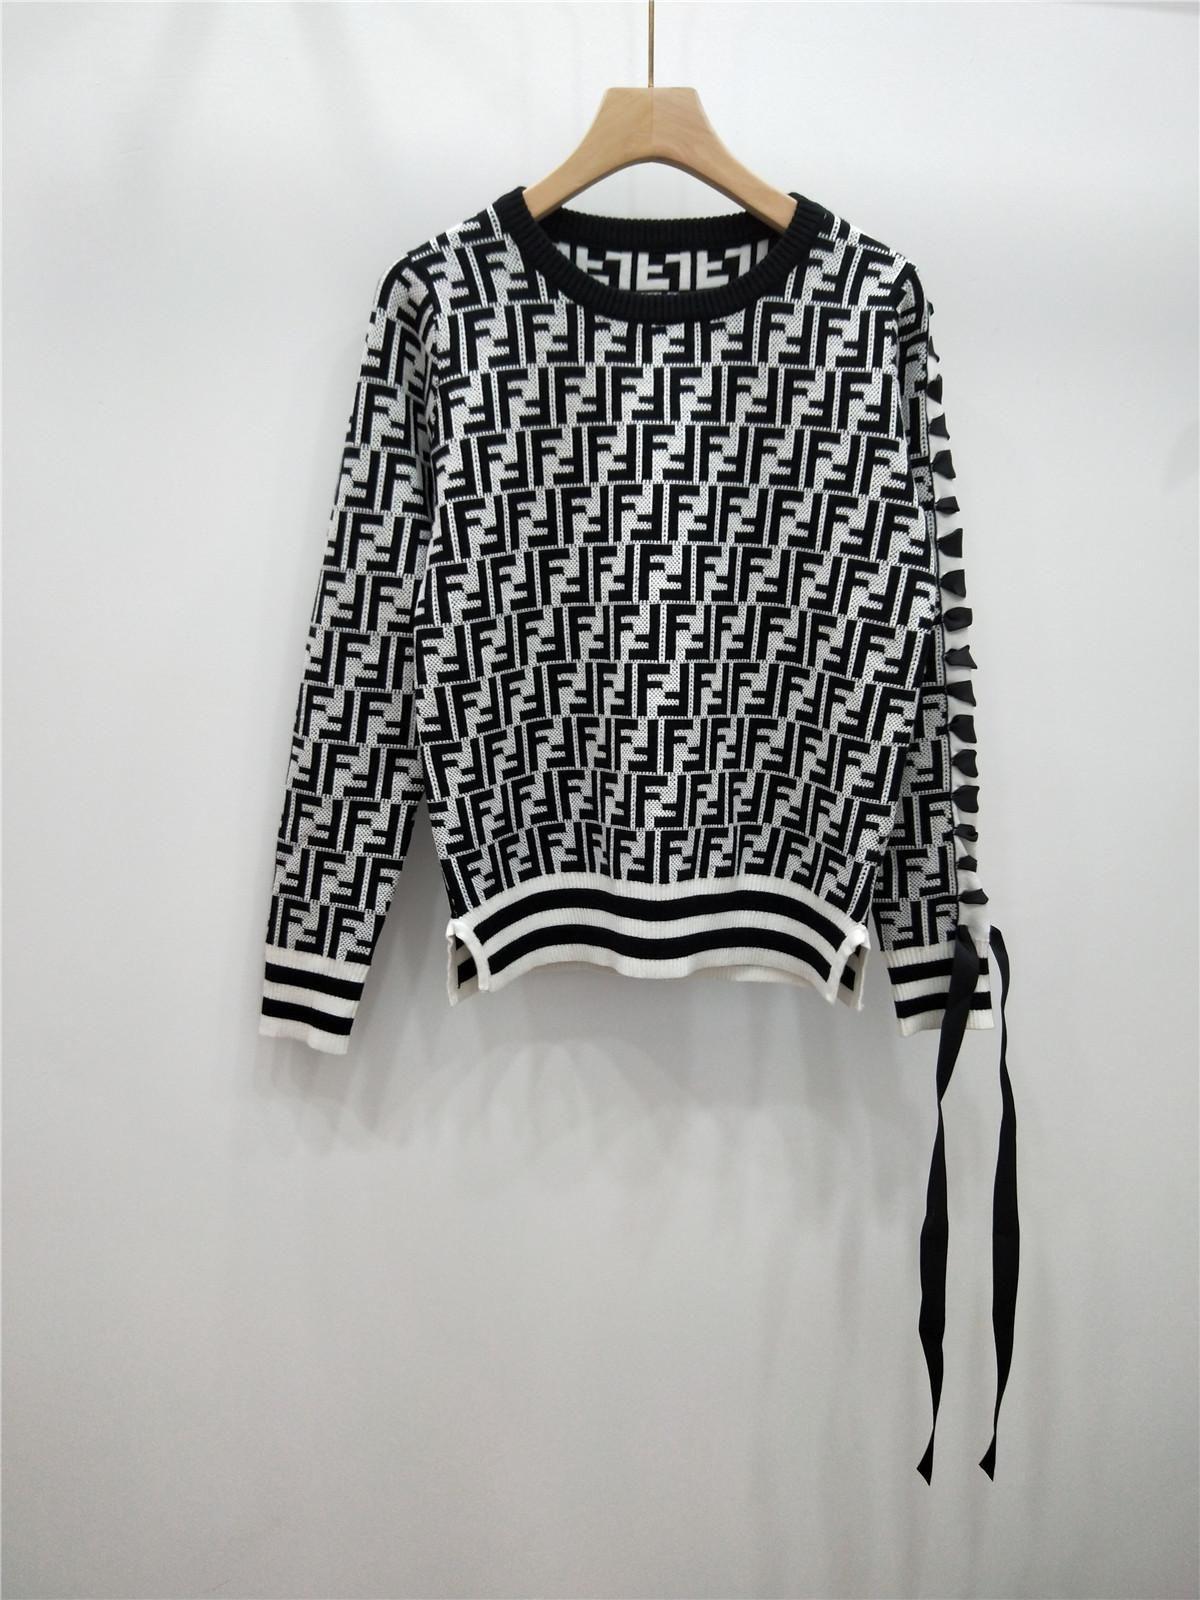 Compre 2019 Otoño E Invierno Manga Larga Vendaje Arco F Letra Manga Tejer  Blusas Suéter Mujer 6 A  50.35 Del Zhangdongyan258  77c5d7f33b12